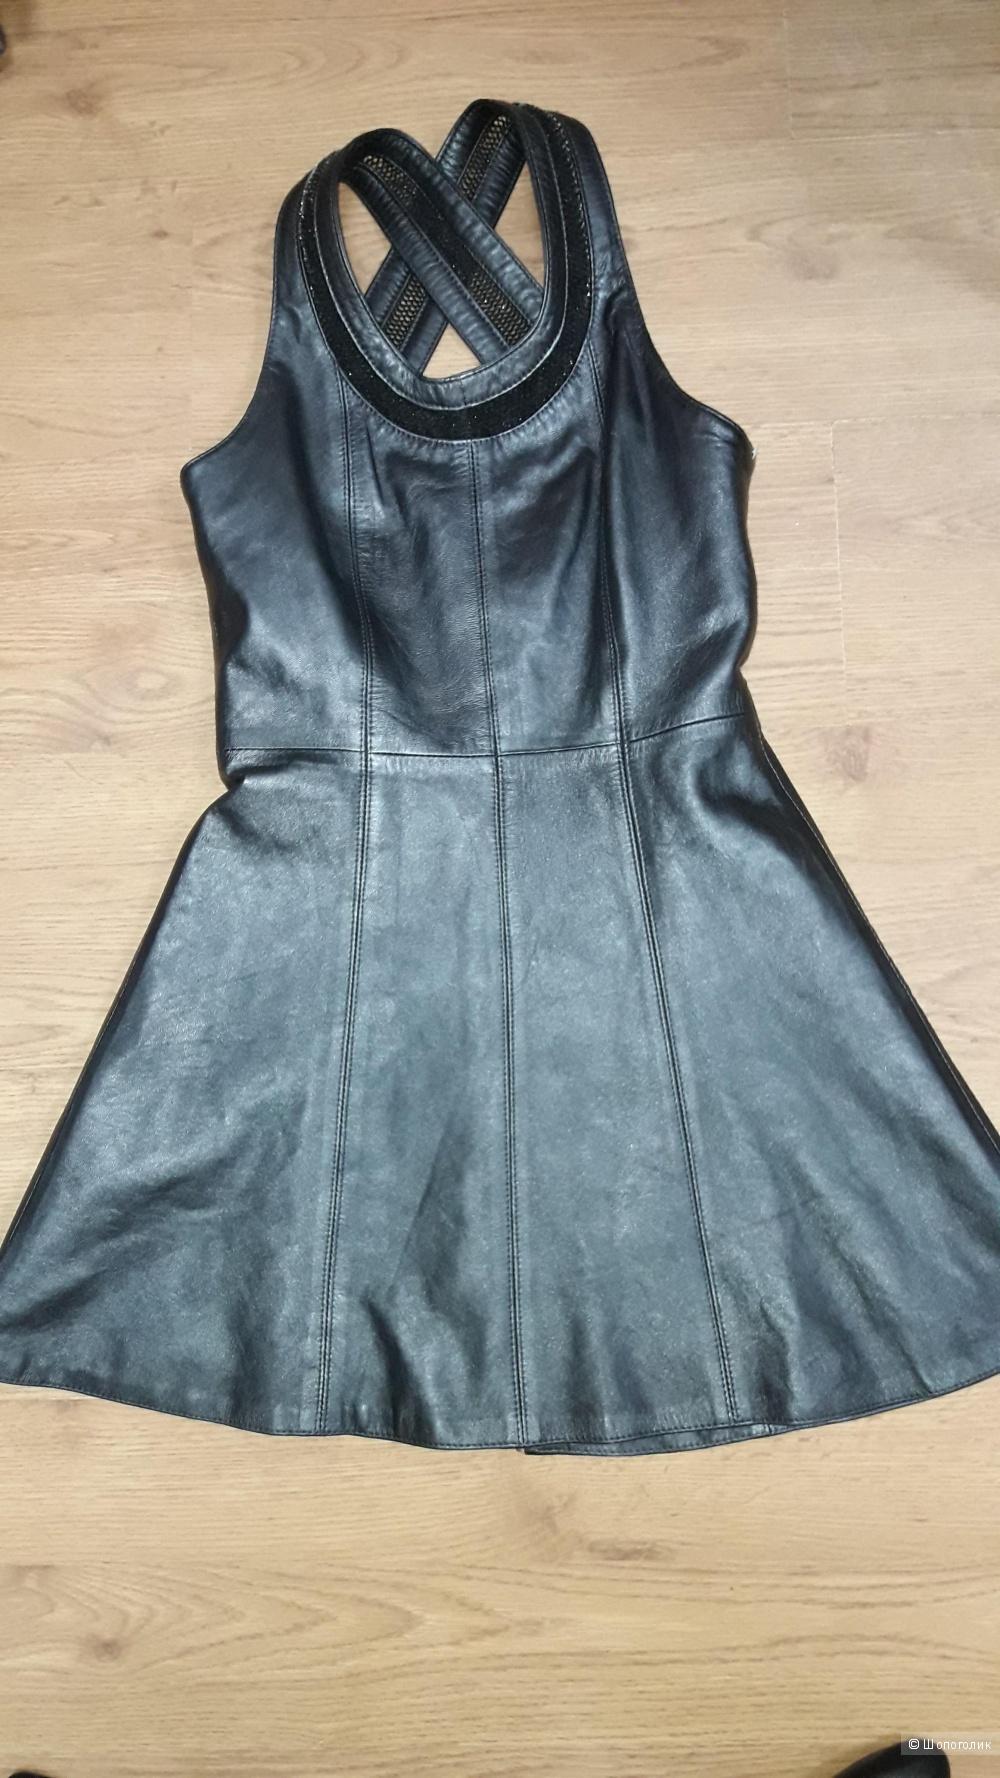 Кожаное платье-сарафан 42 размера.